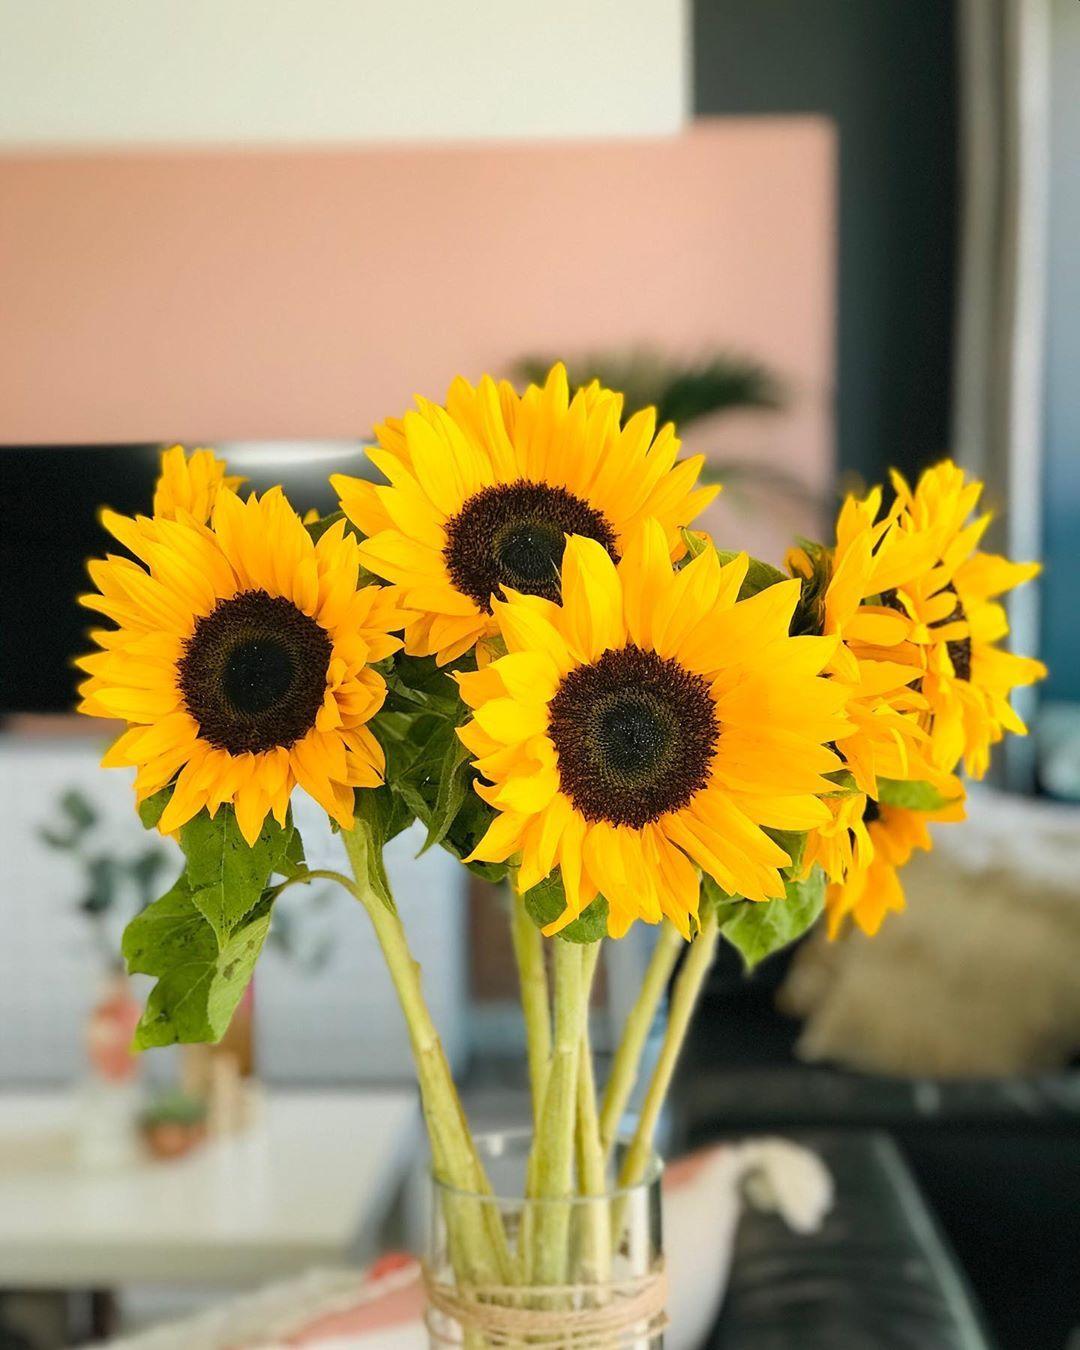 Well hello sunshine ☀️ 🌻☺️ #sunflowers🌻 #flowers  #pimpupmypad #interiors123 #yourlayeredhome #howirent #interior123 #homestyling #uk #london #homedecor